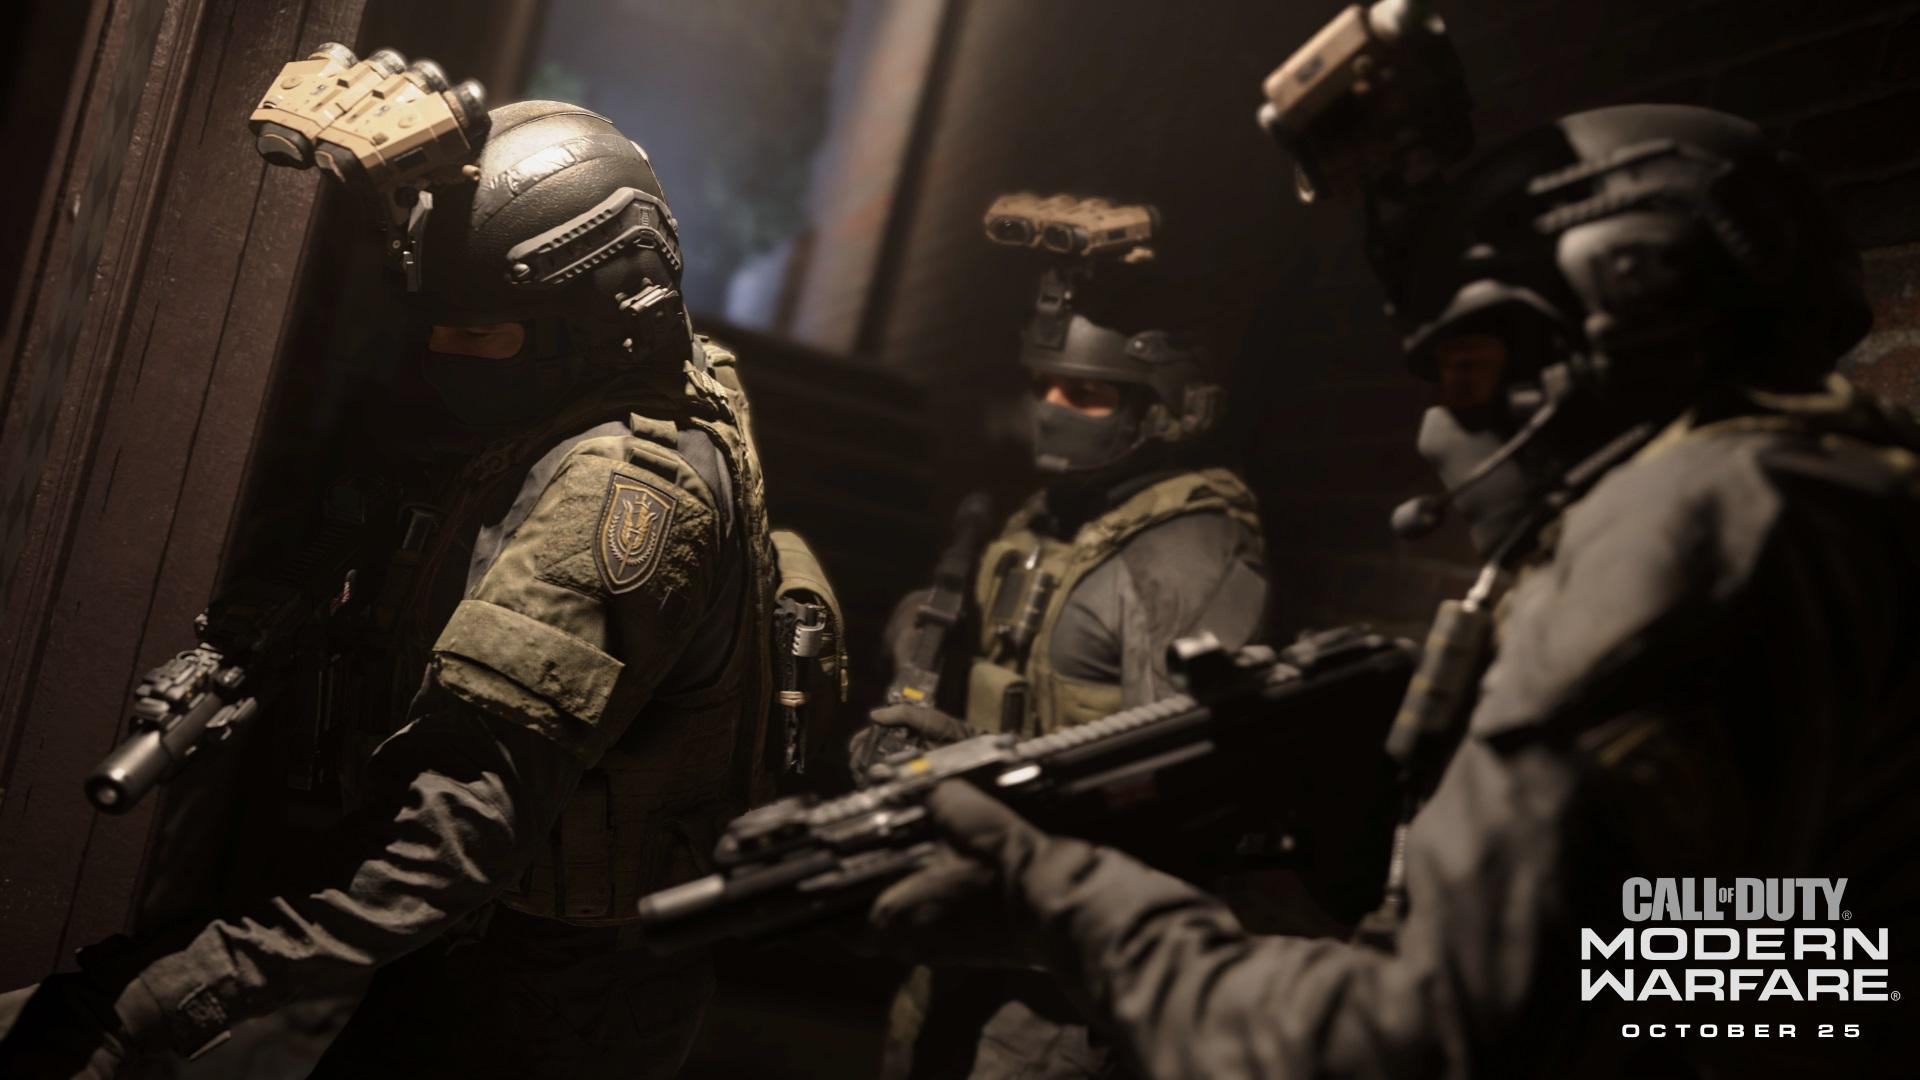 call of duty modern warfare video game wallpaper 68505